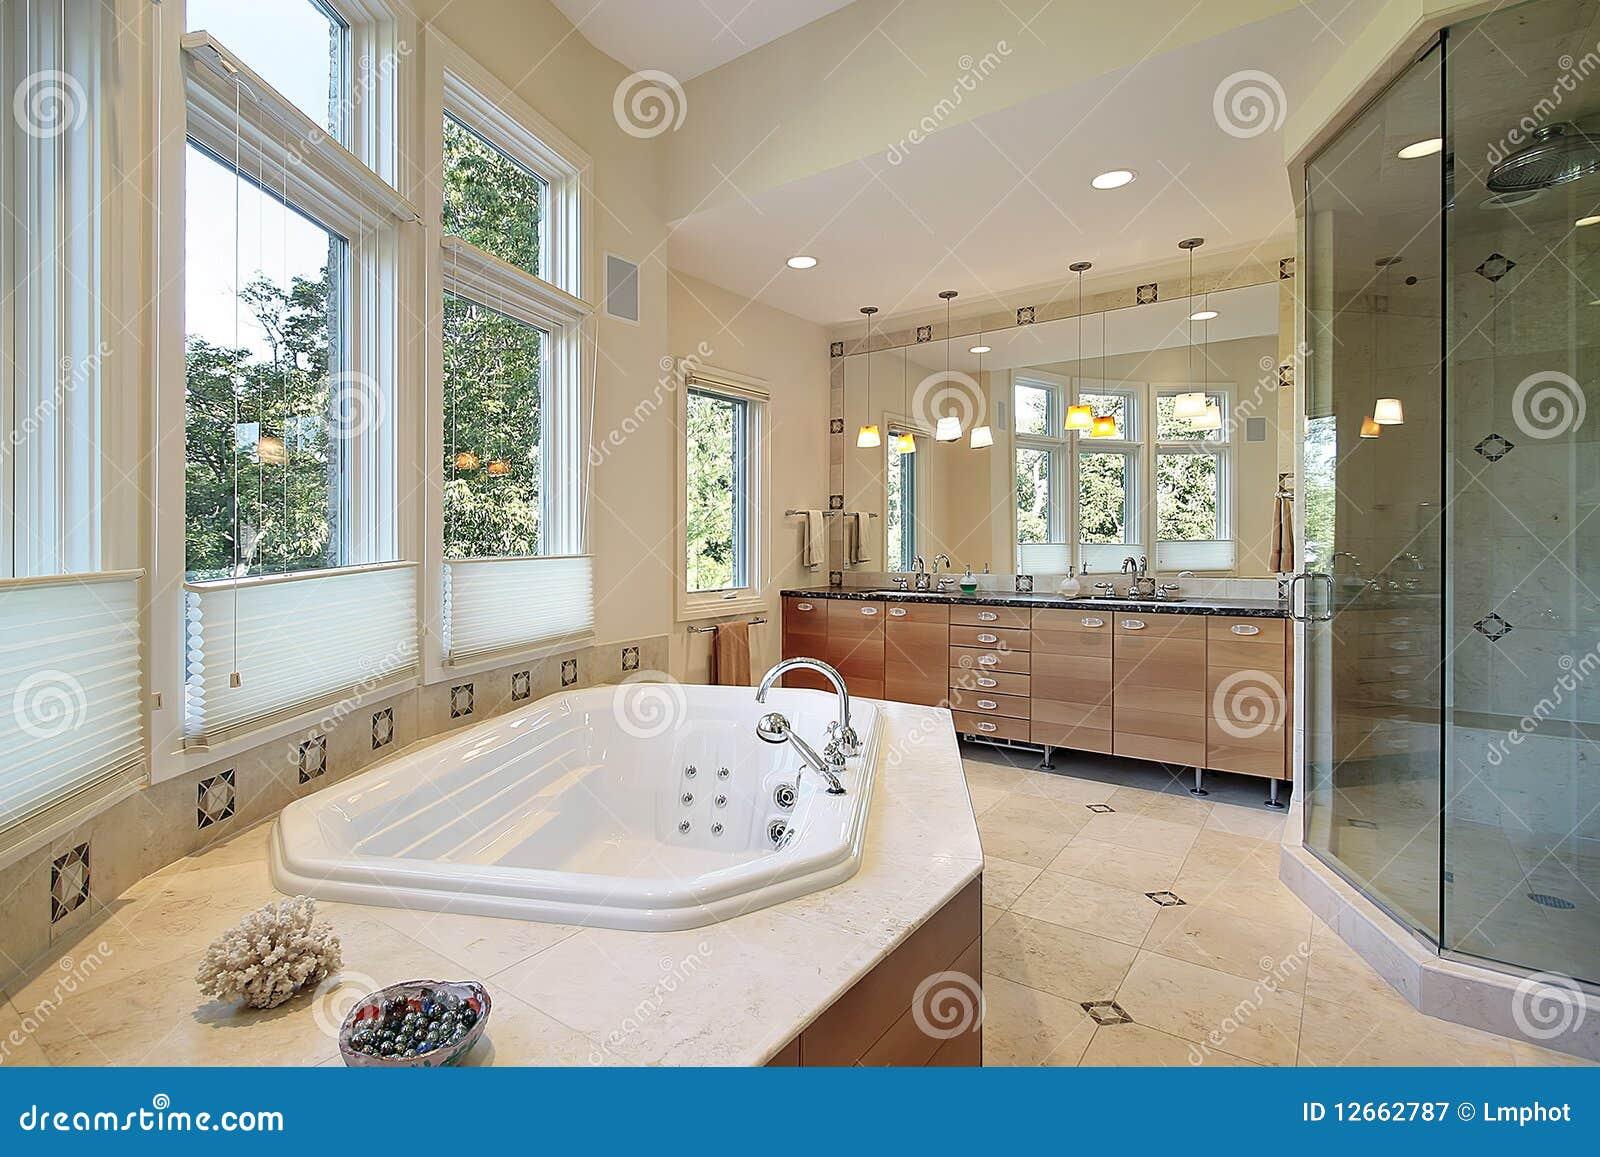 Master Bath With Large Glass Shower Stock Image Image 12662787